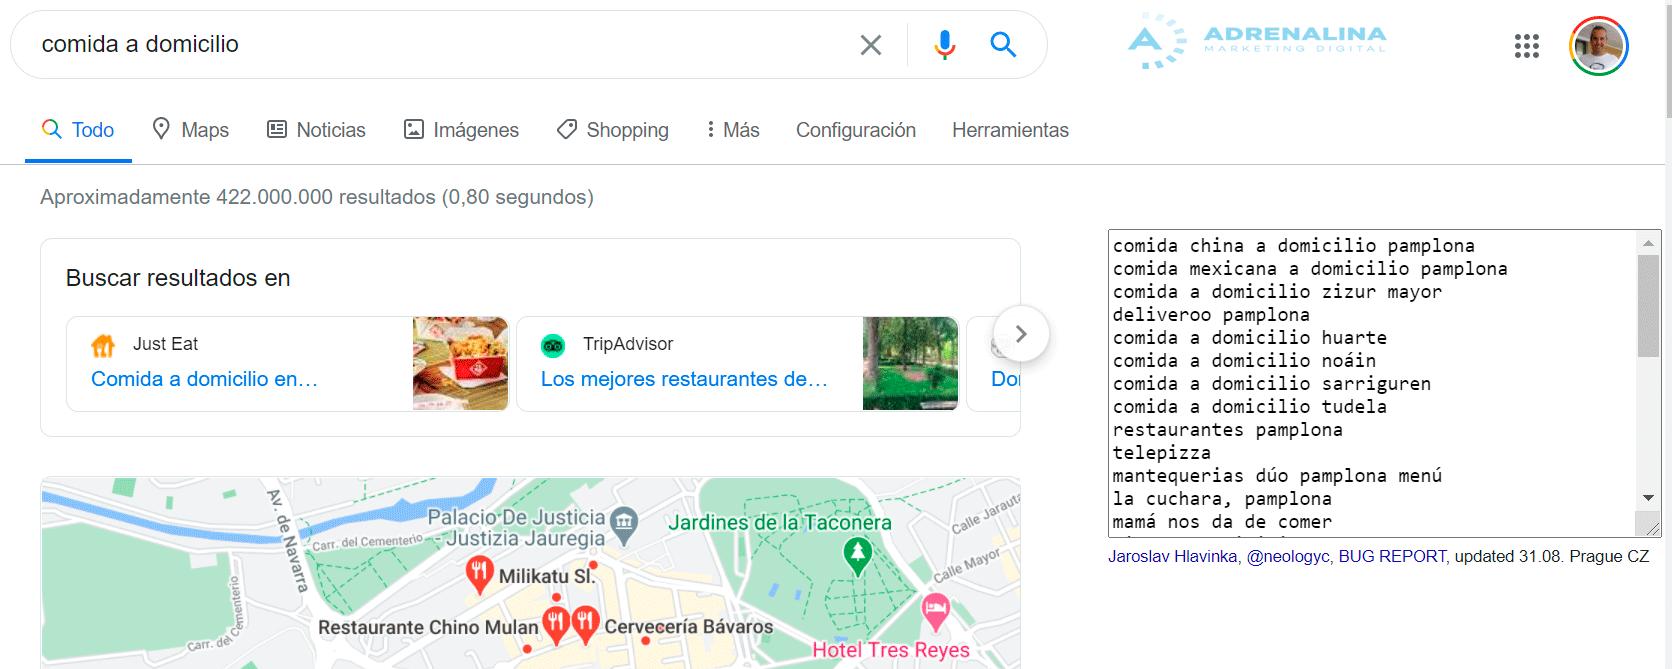 extension busquedas relacionadas